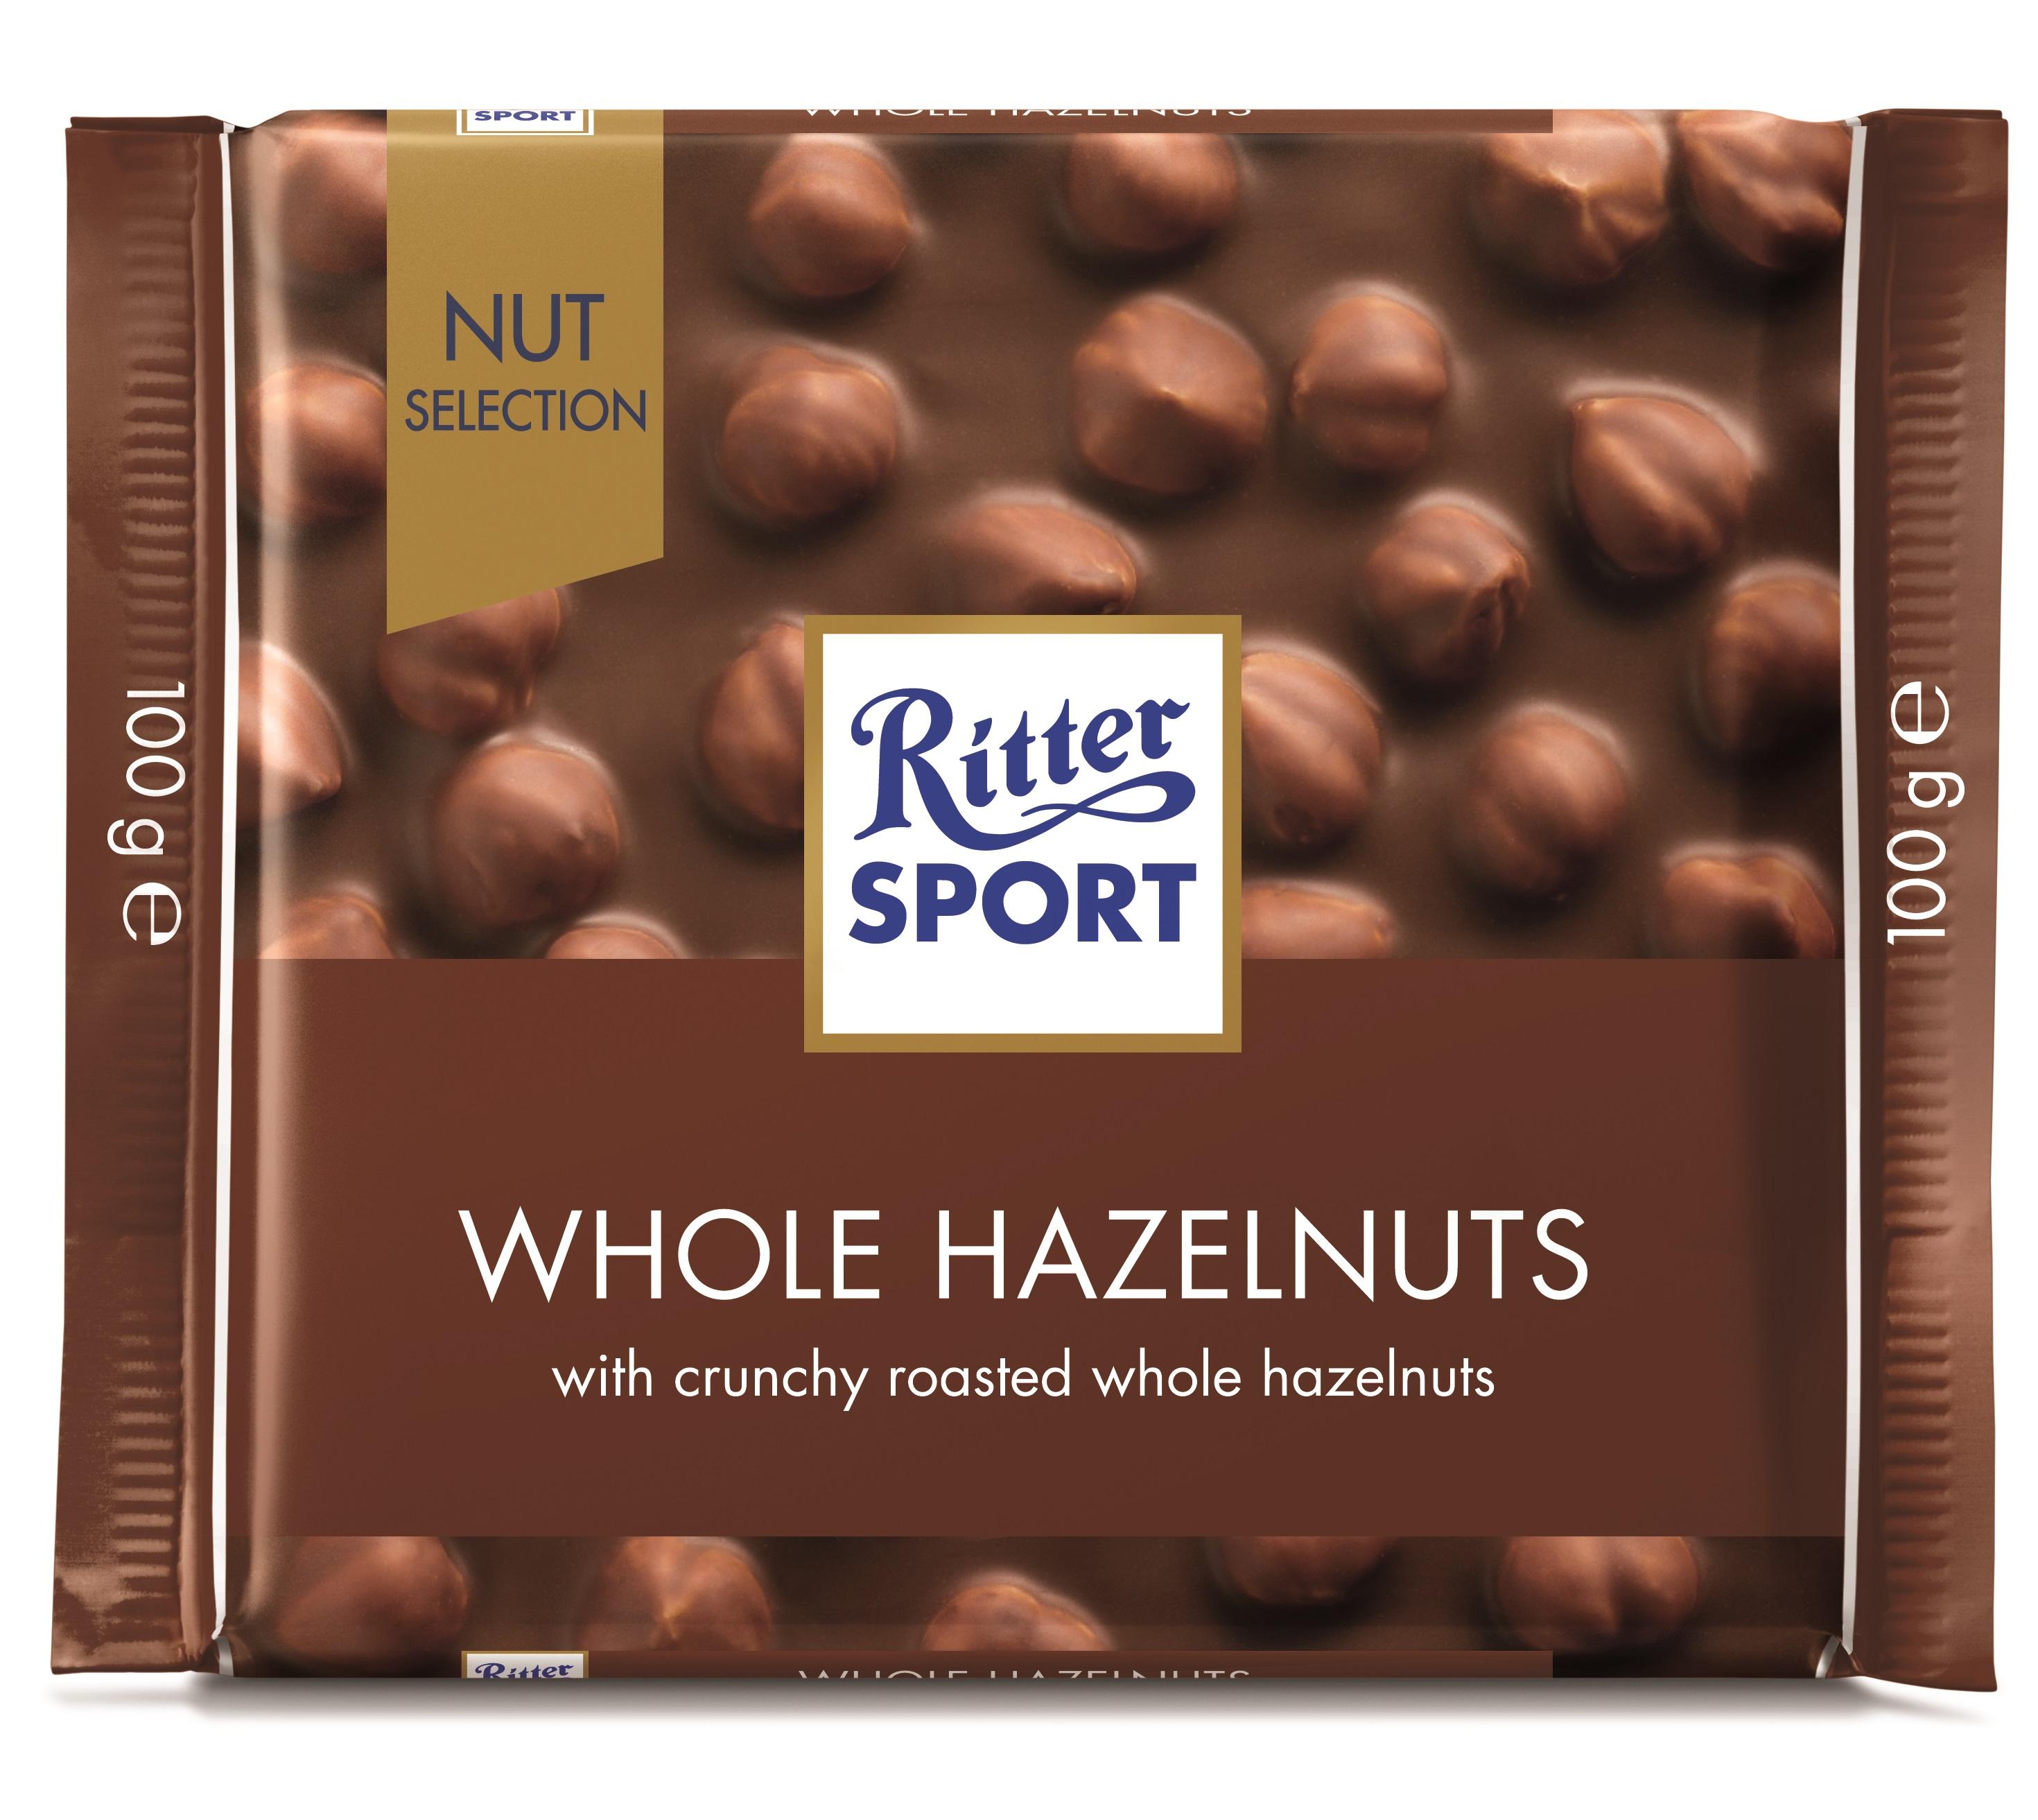 Ritter Sport Whole Hazelnuts 100g Duty Free Antalya Airport Shops